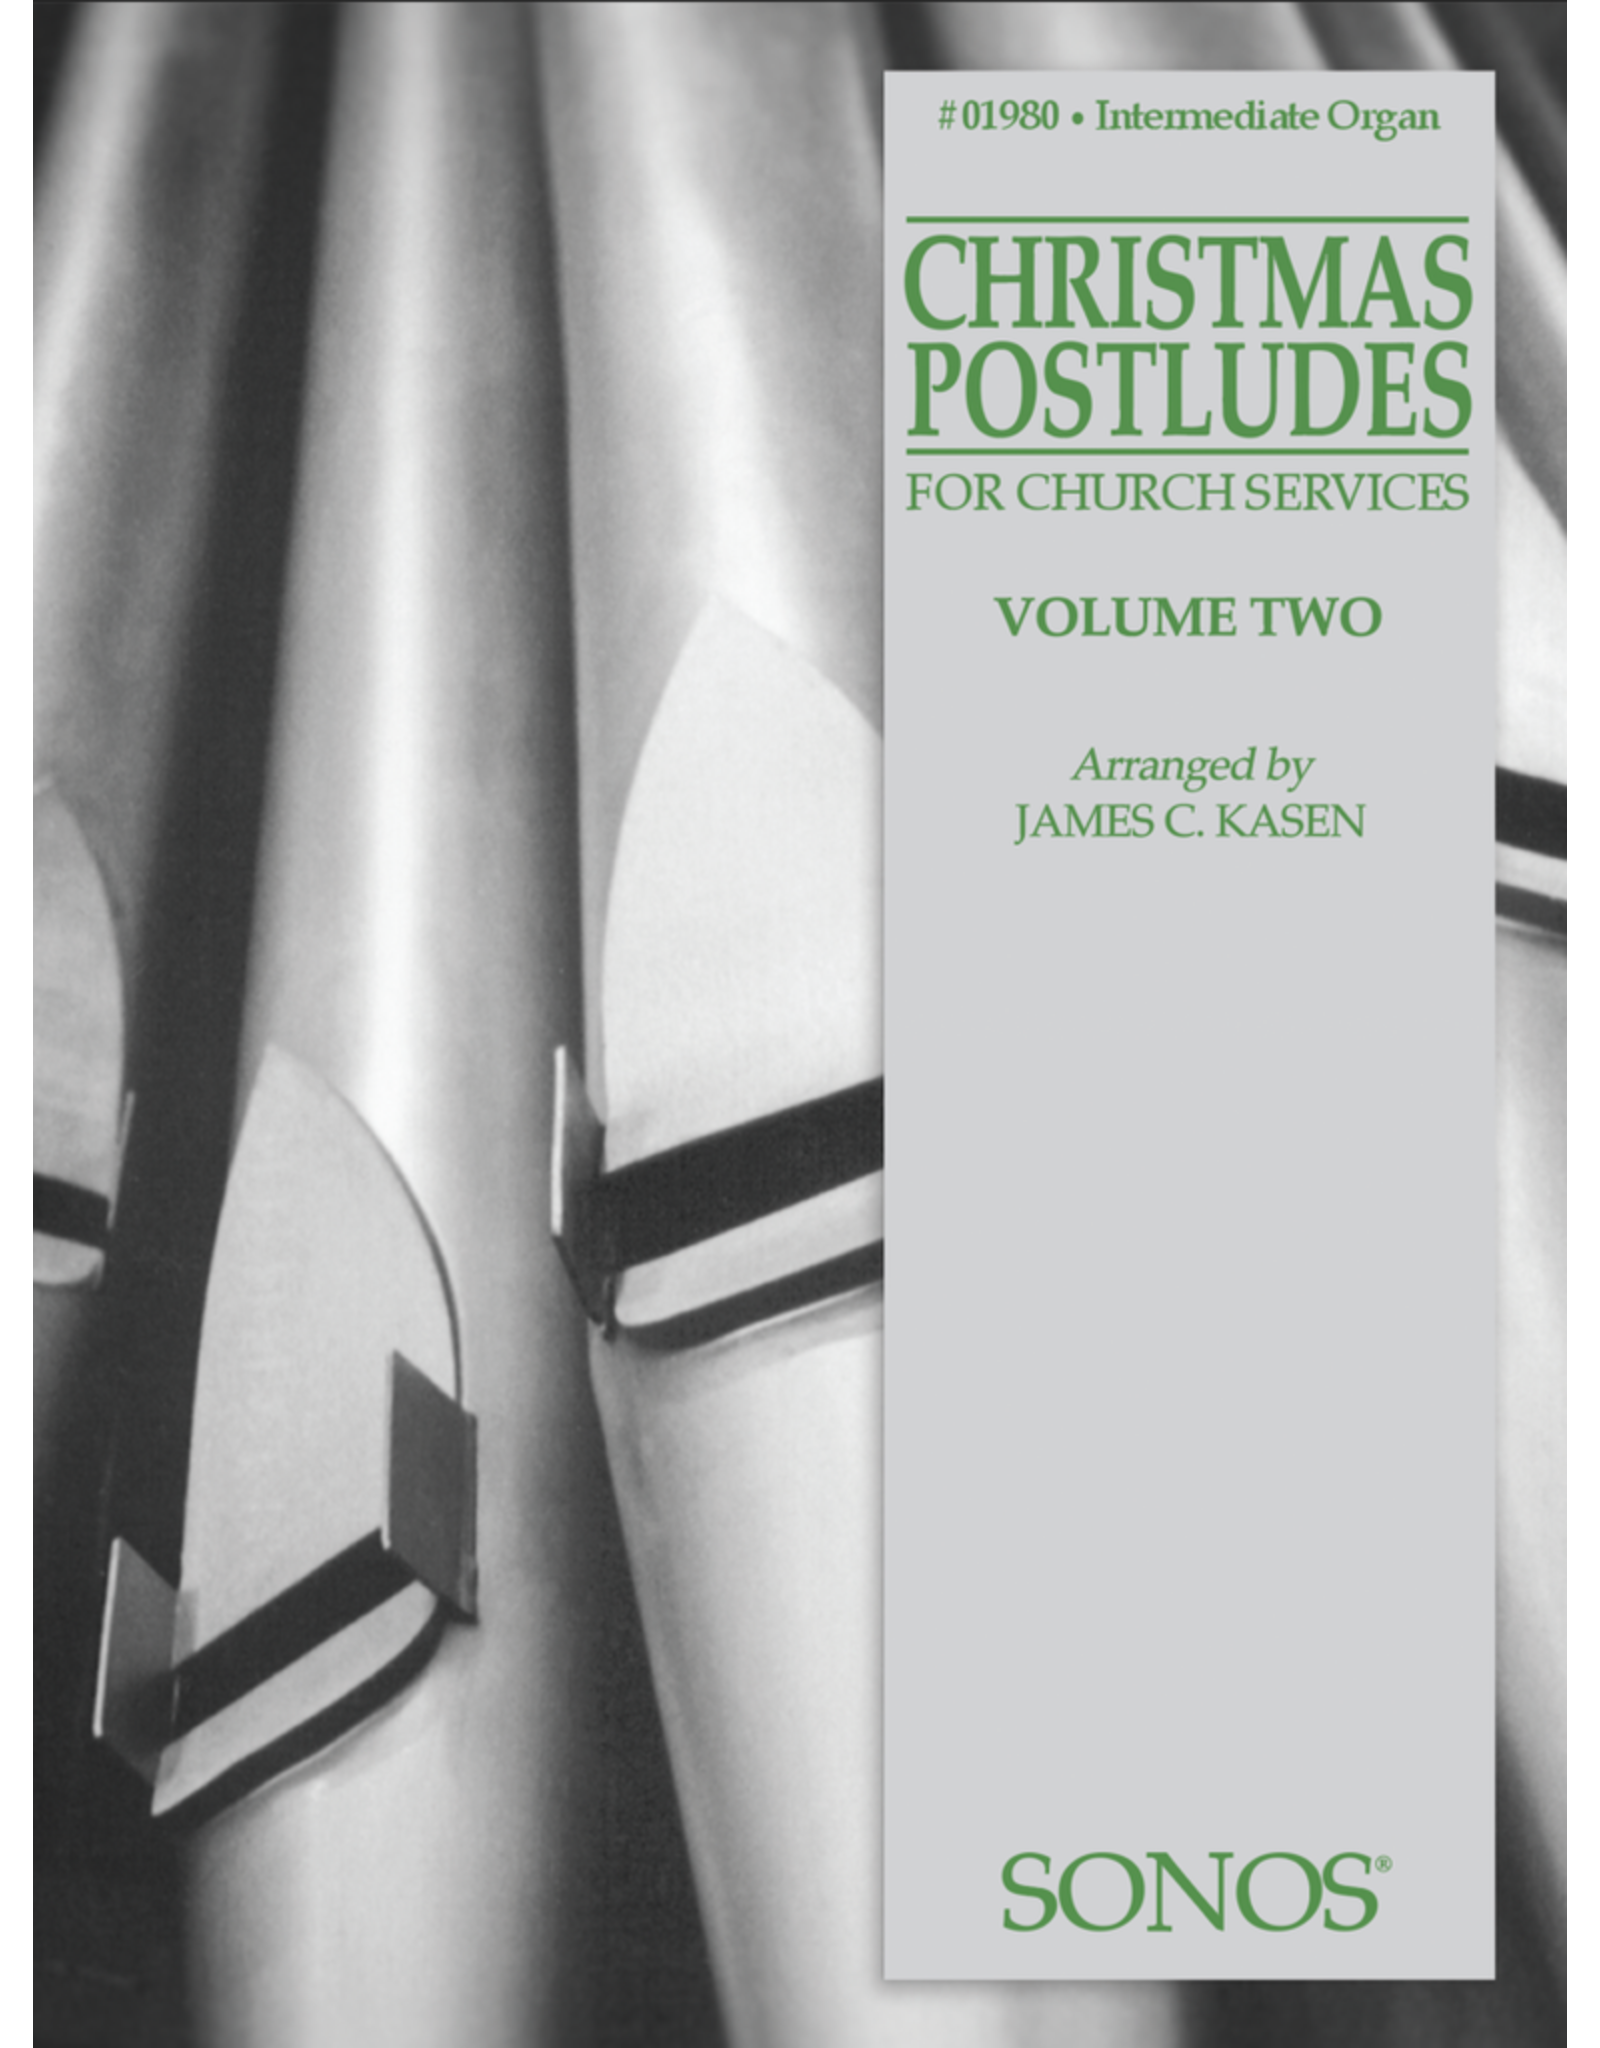 Jackman Music Christmas Postludes Vol. 2 for Organ arr. James C. Kasen